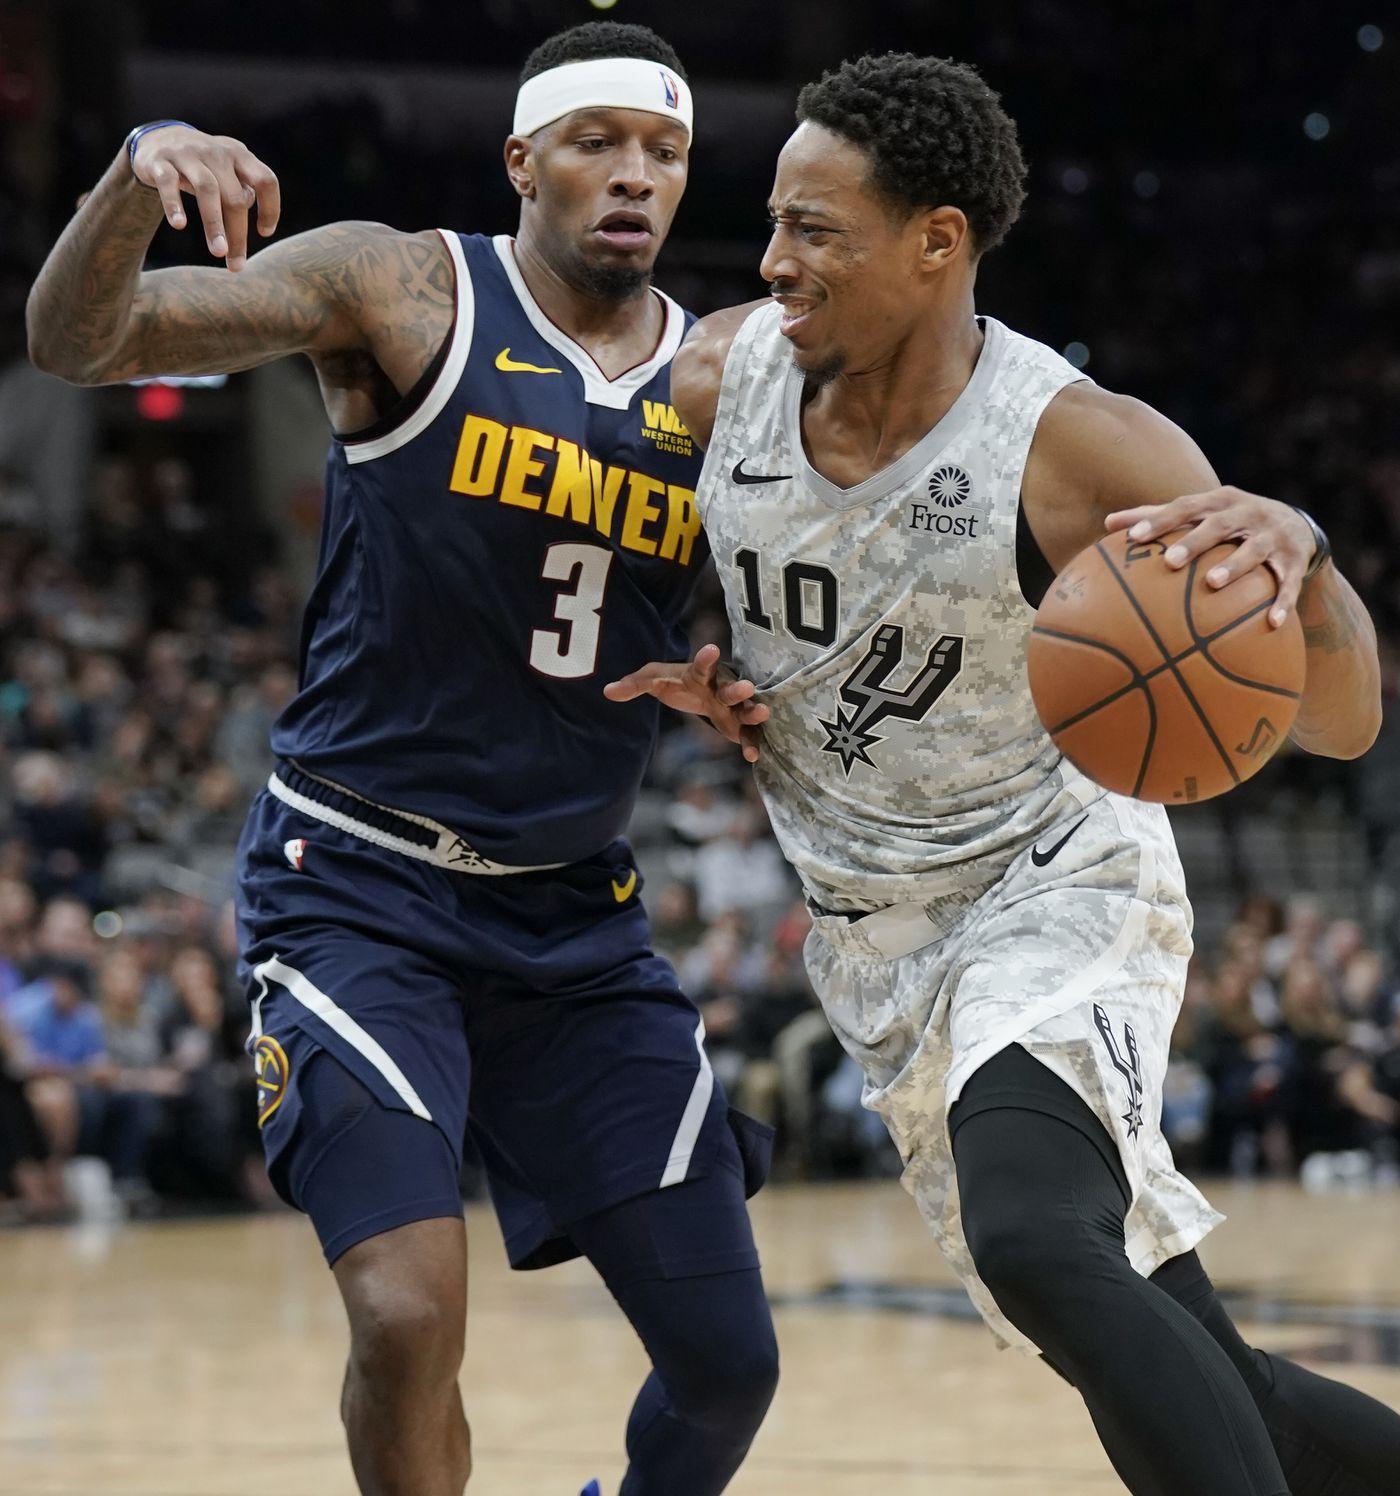 Denver Nuggets Basketball: DeRozan, Aldridge Lead Spurs Past Nuggets 111-103